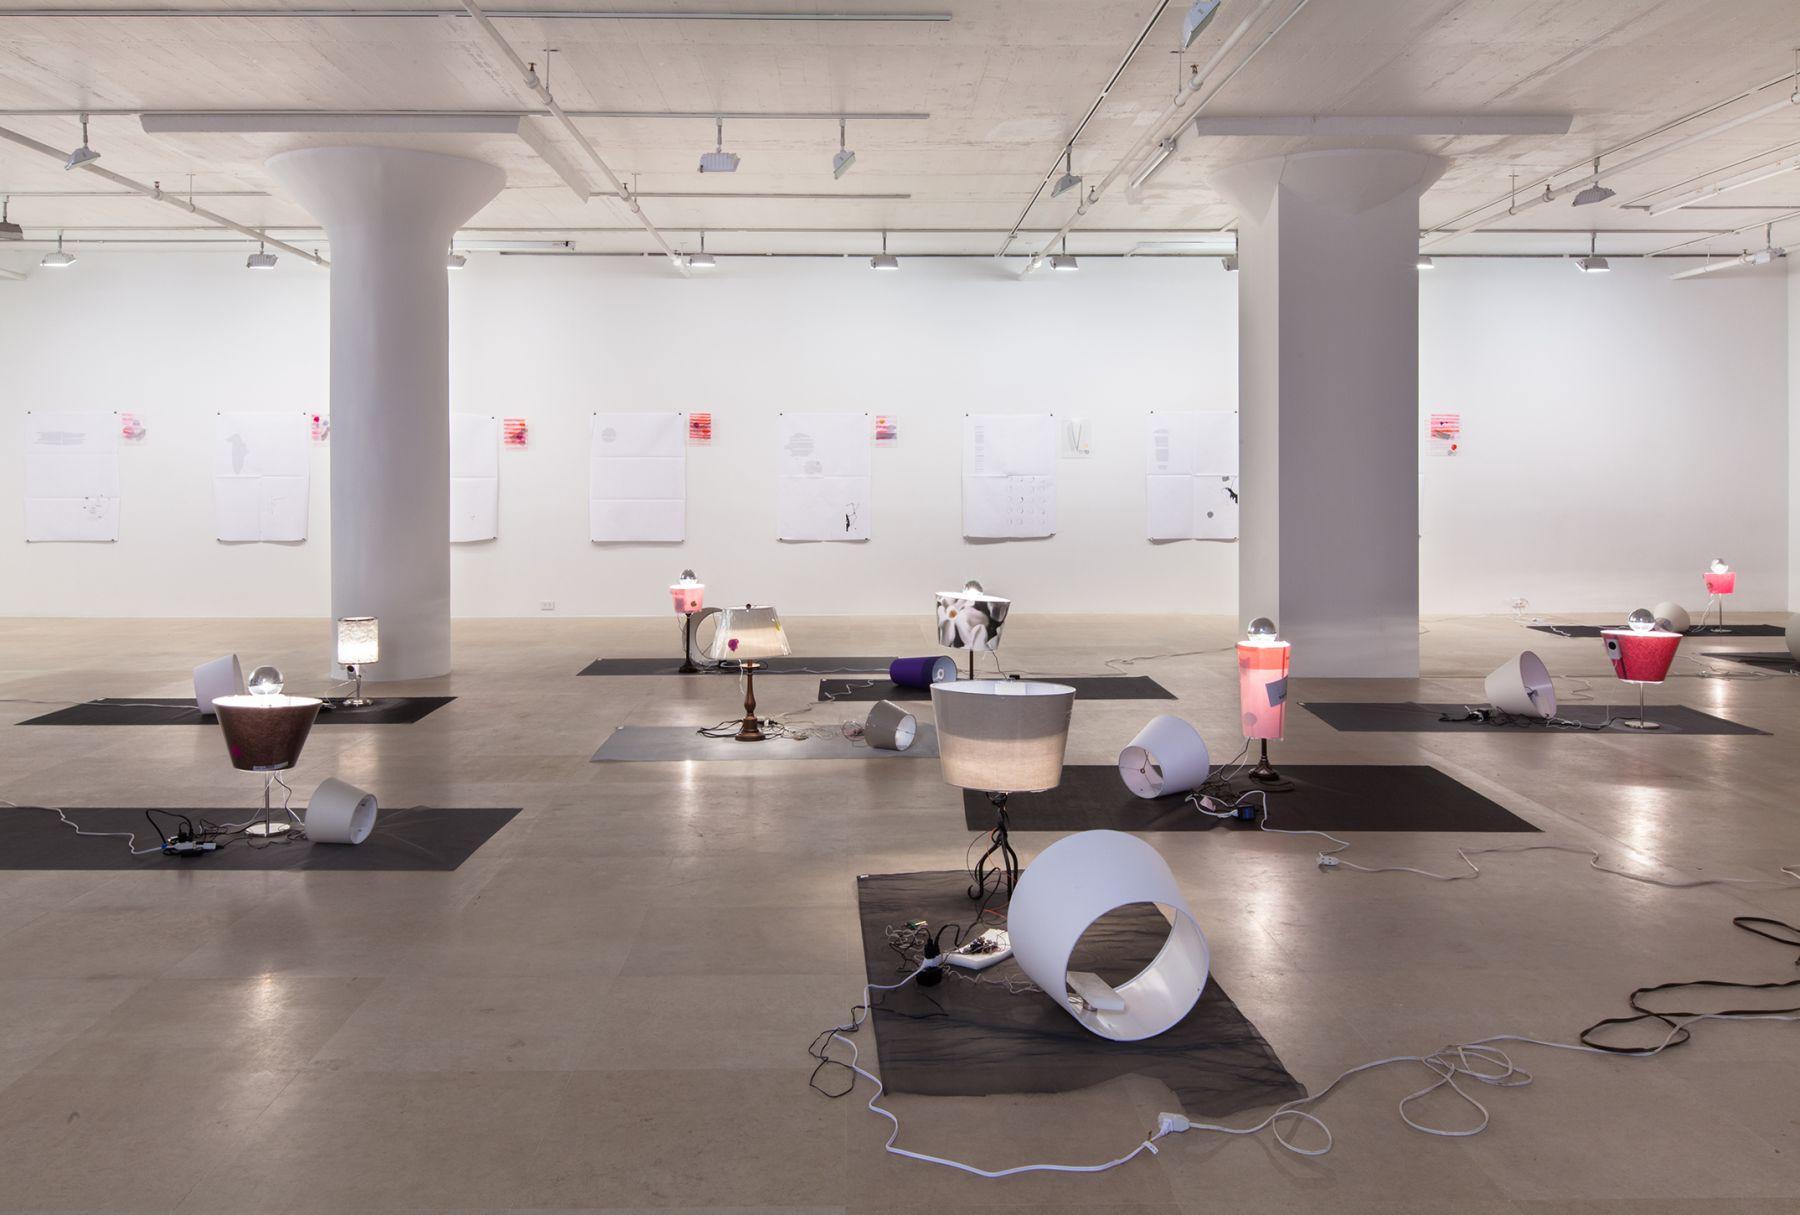 Josef Strau, Installation view, Exercises ab initio…, Greene Naftali, New York, 2012